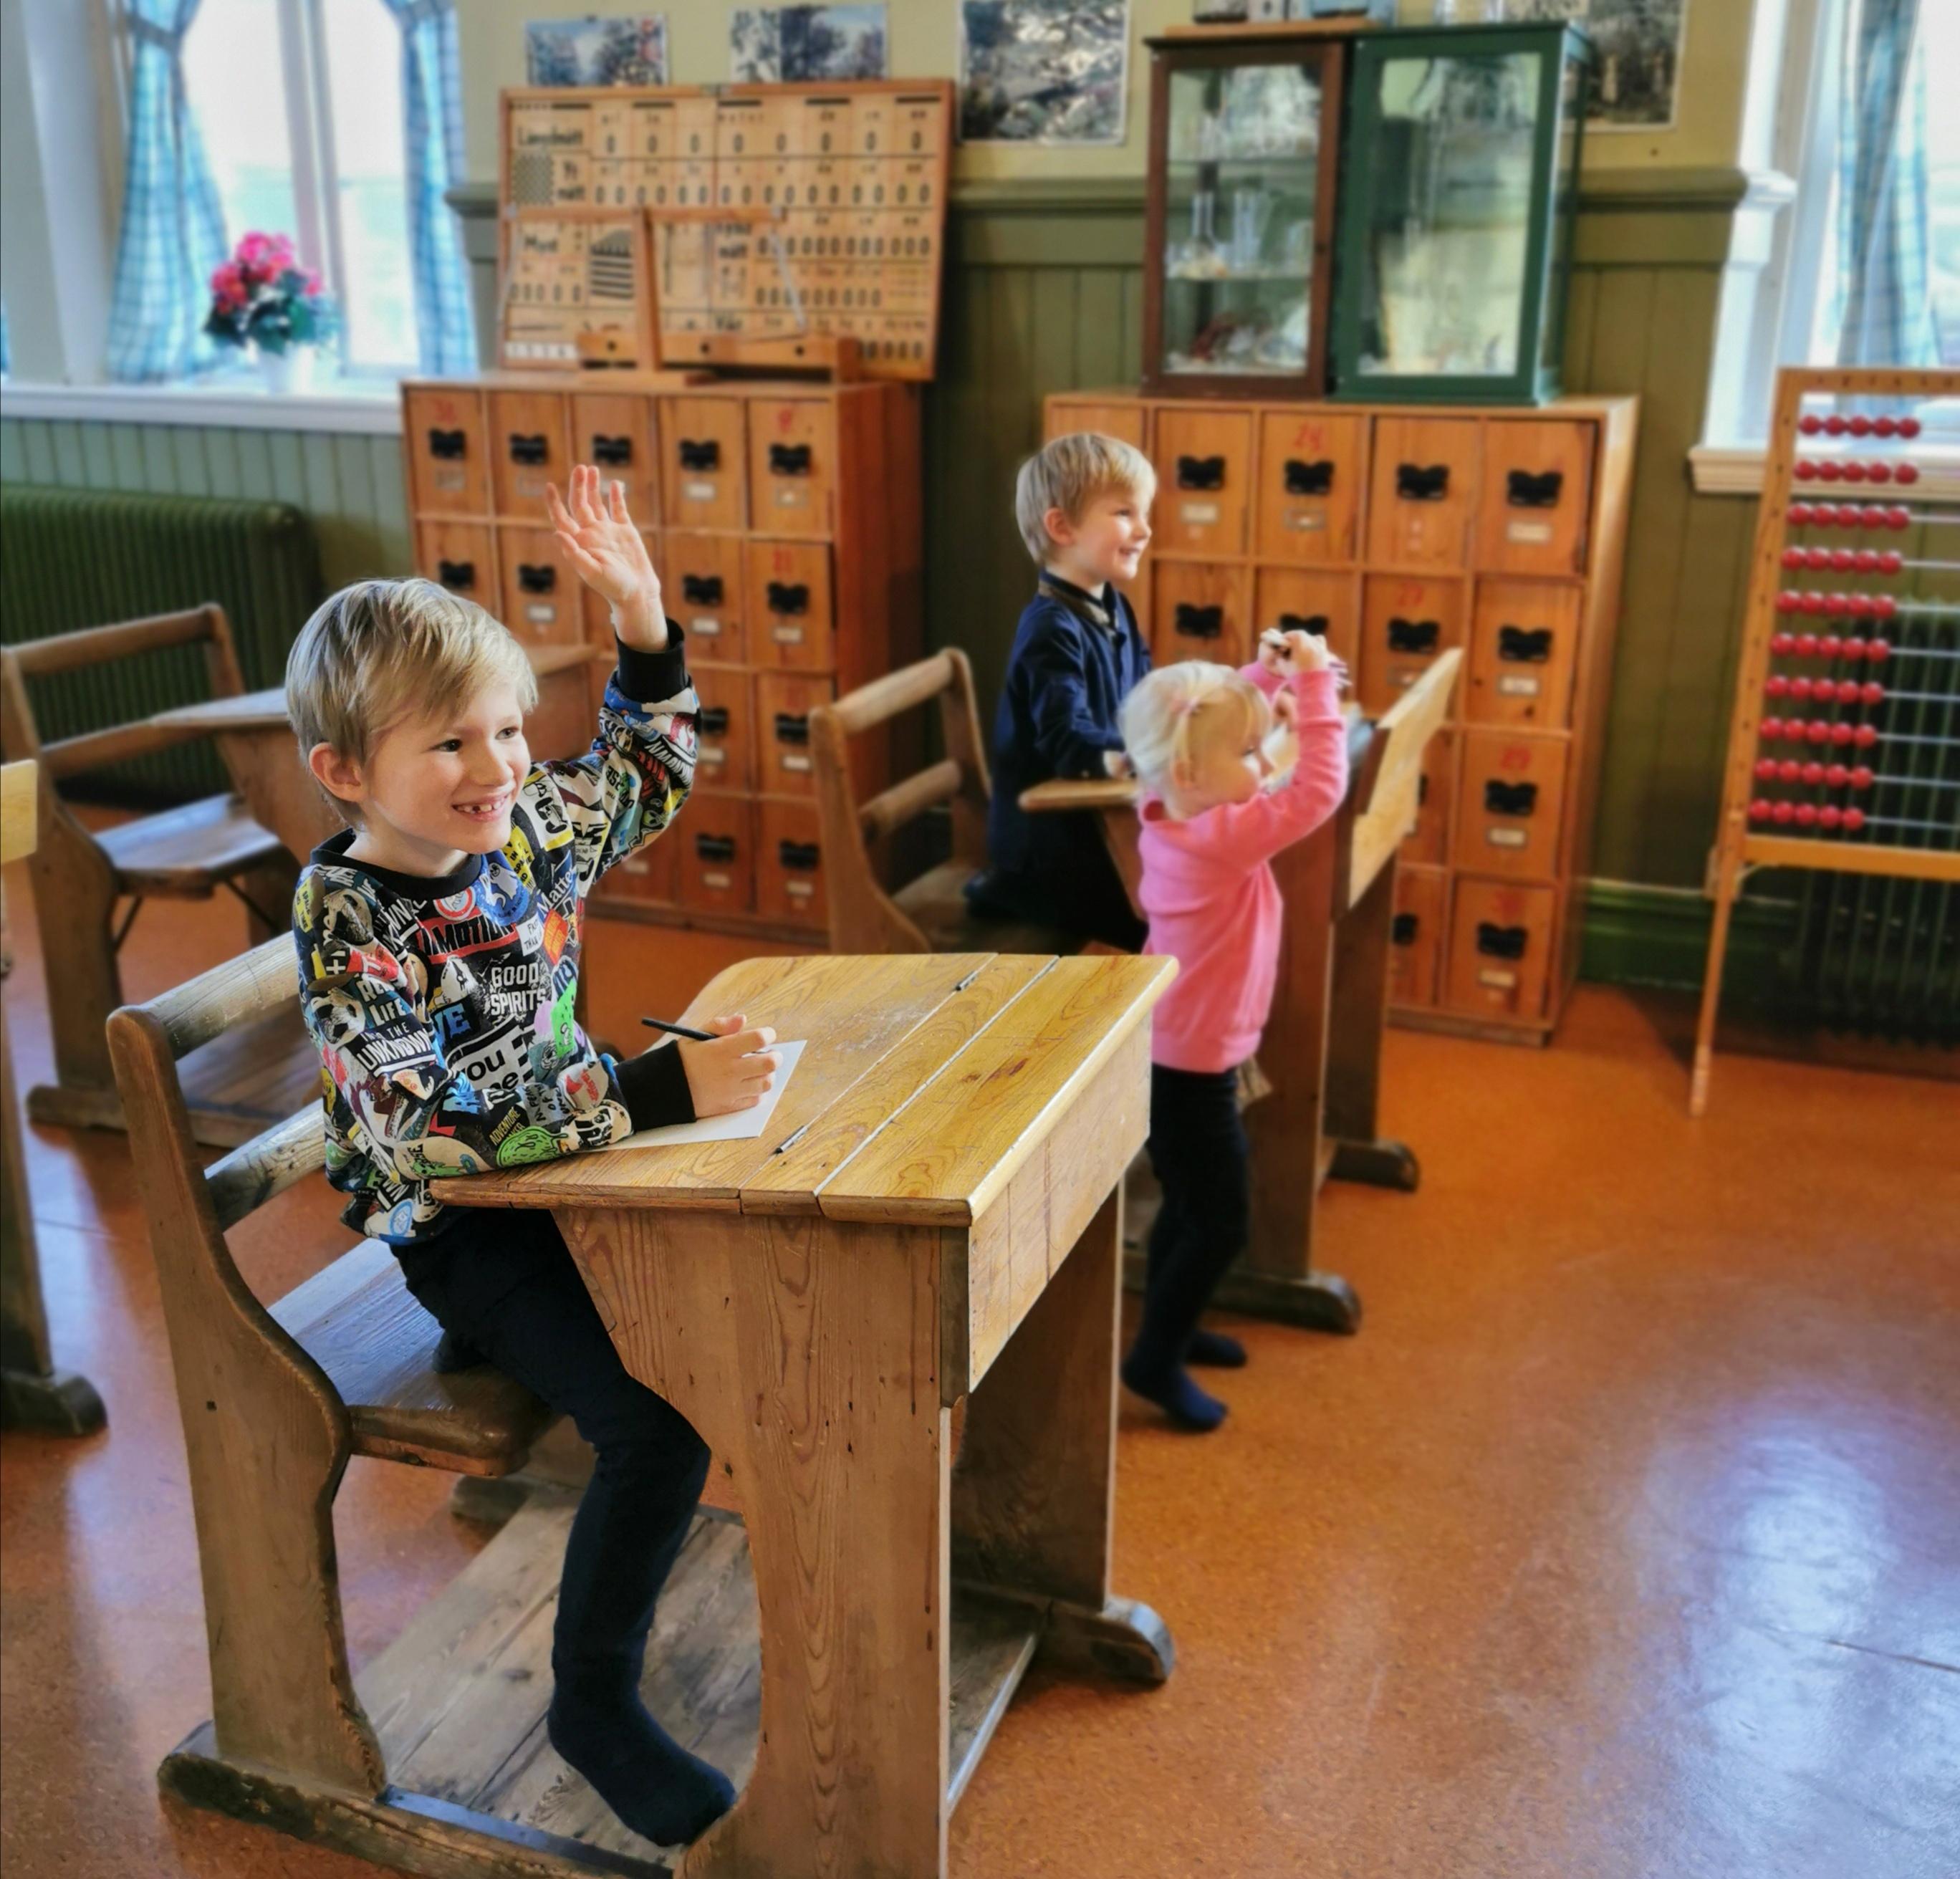 Leka skola i gammal miljö